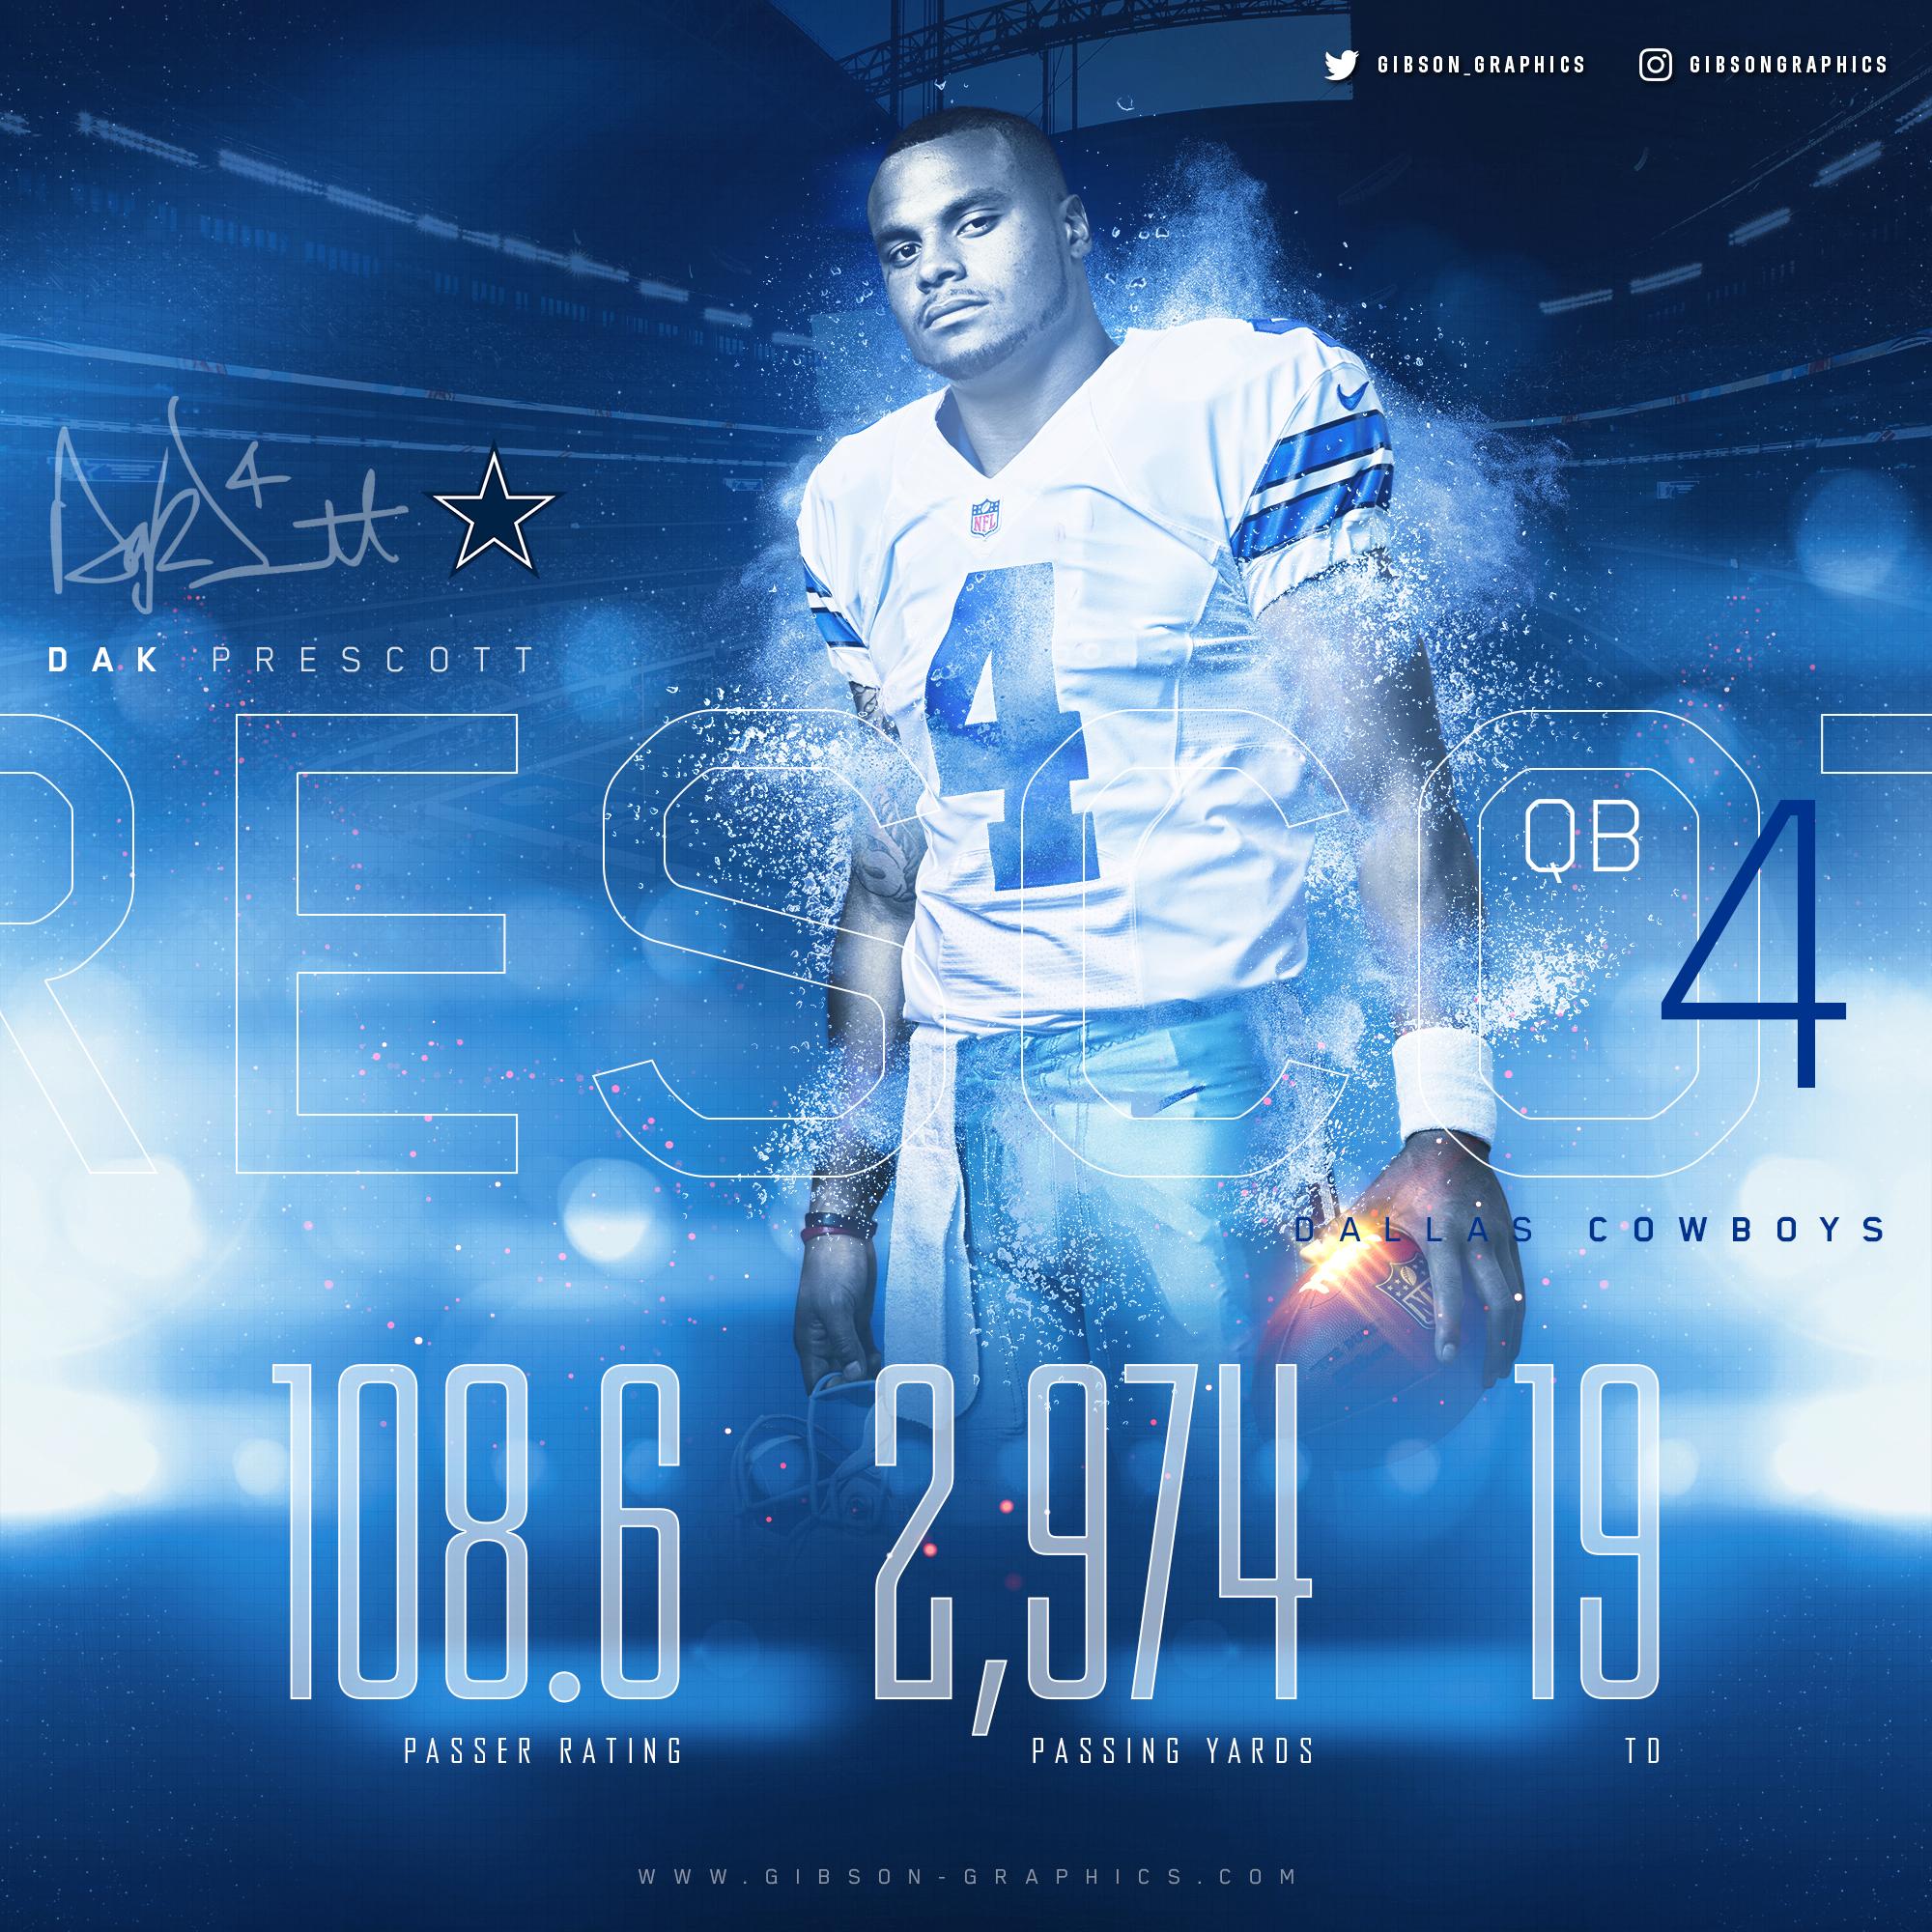 Dak_Prescott_2016_Cowboys_Infographic